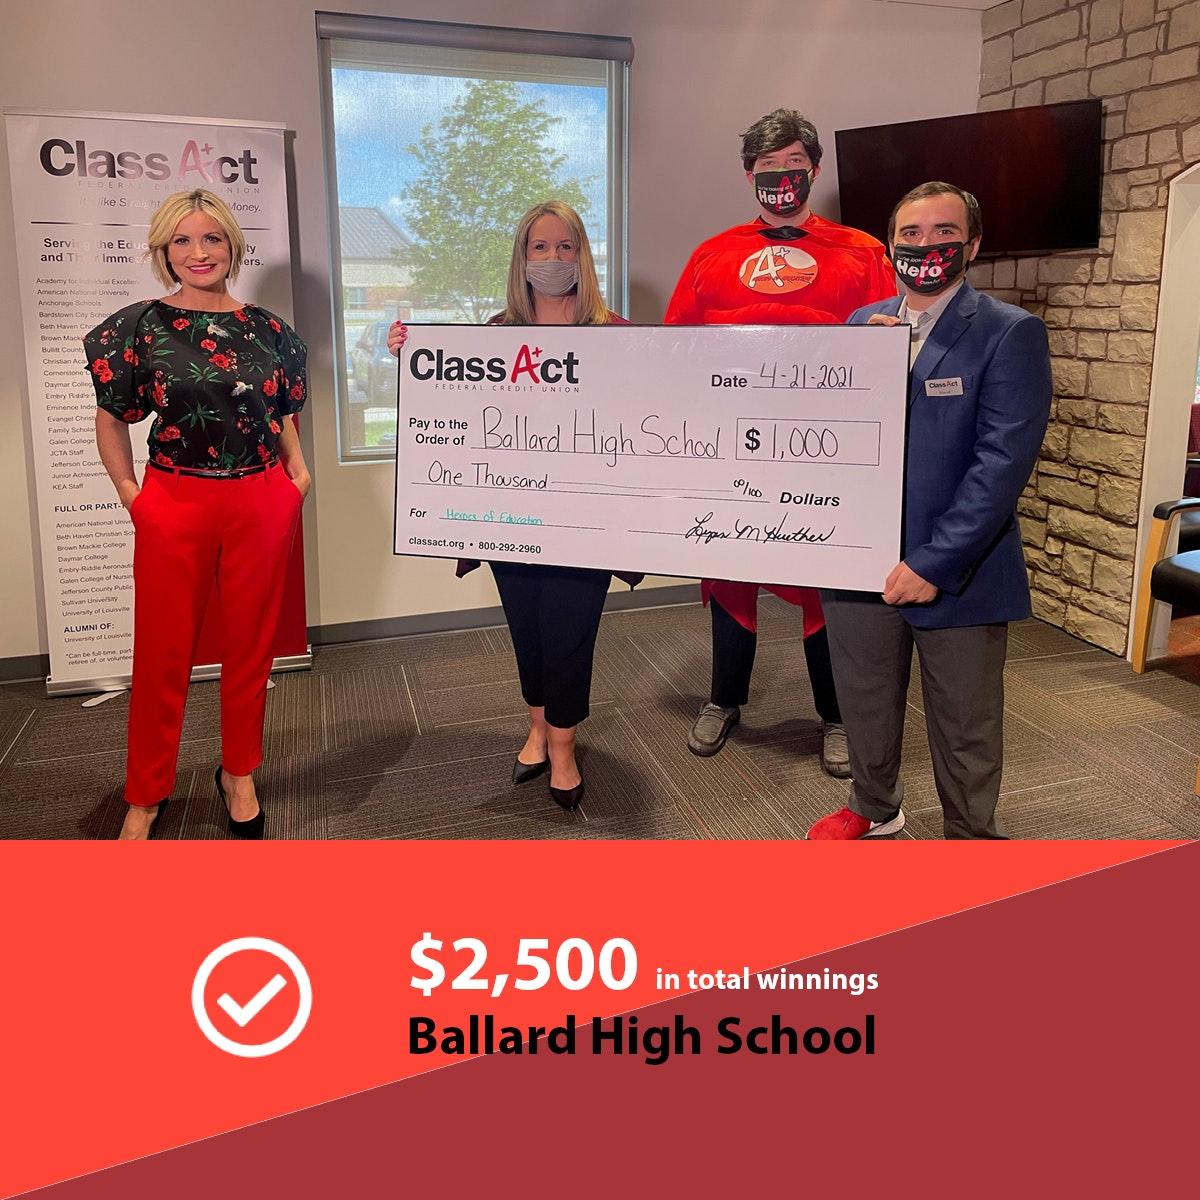 2500 Check Image Ballard High School 2